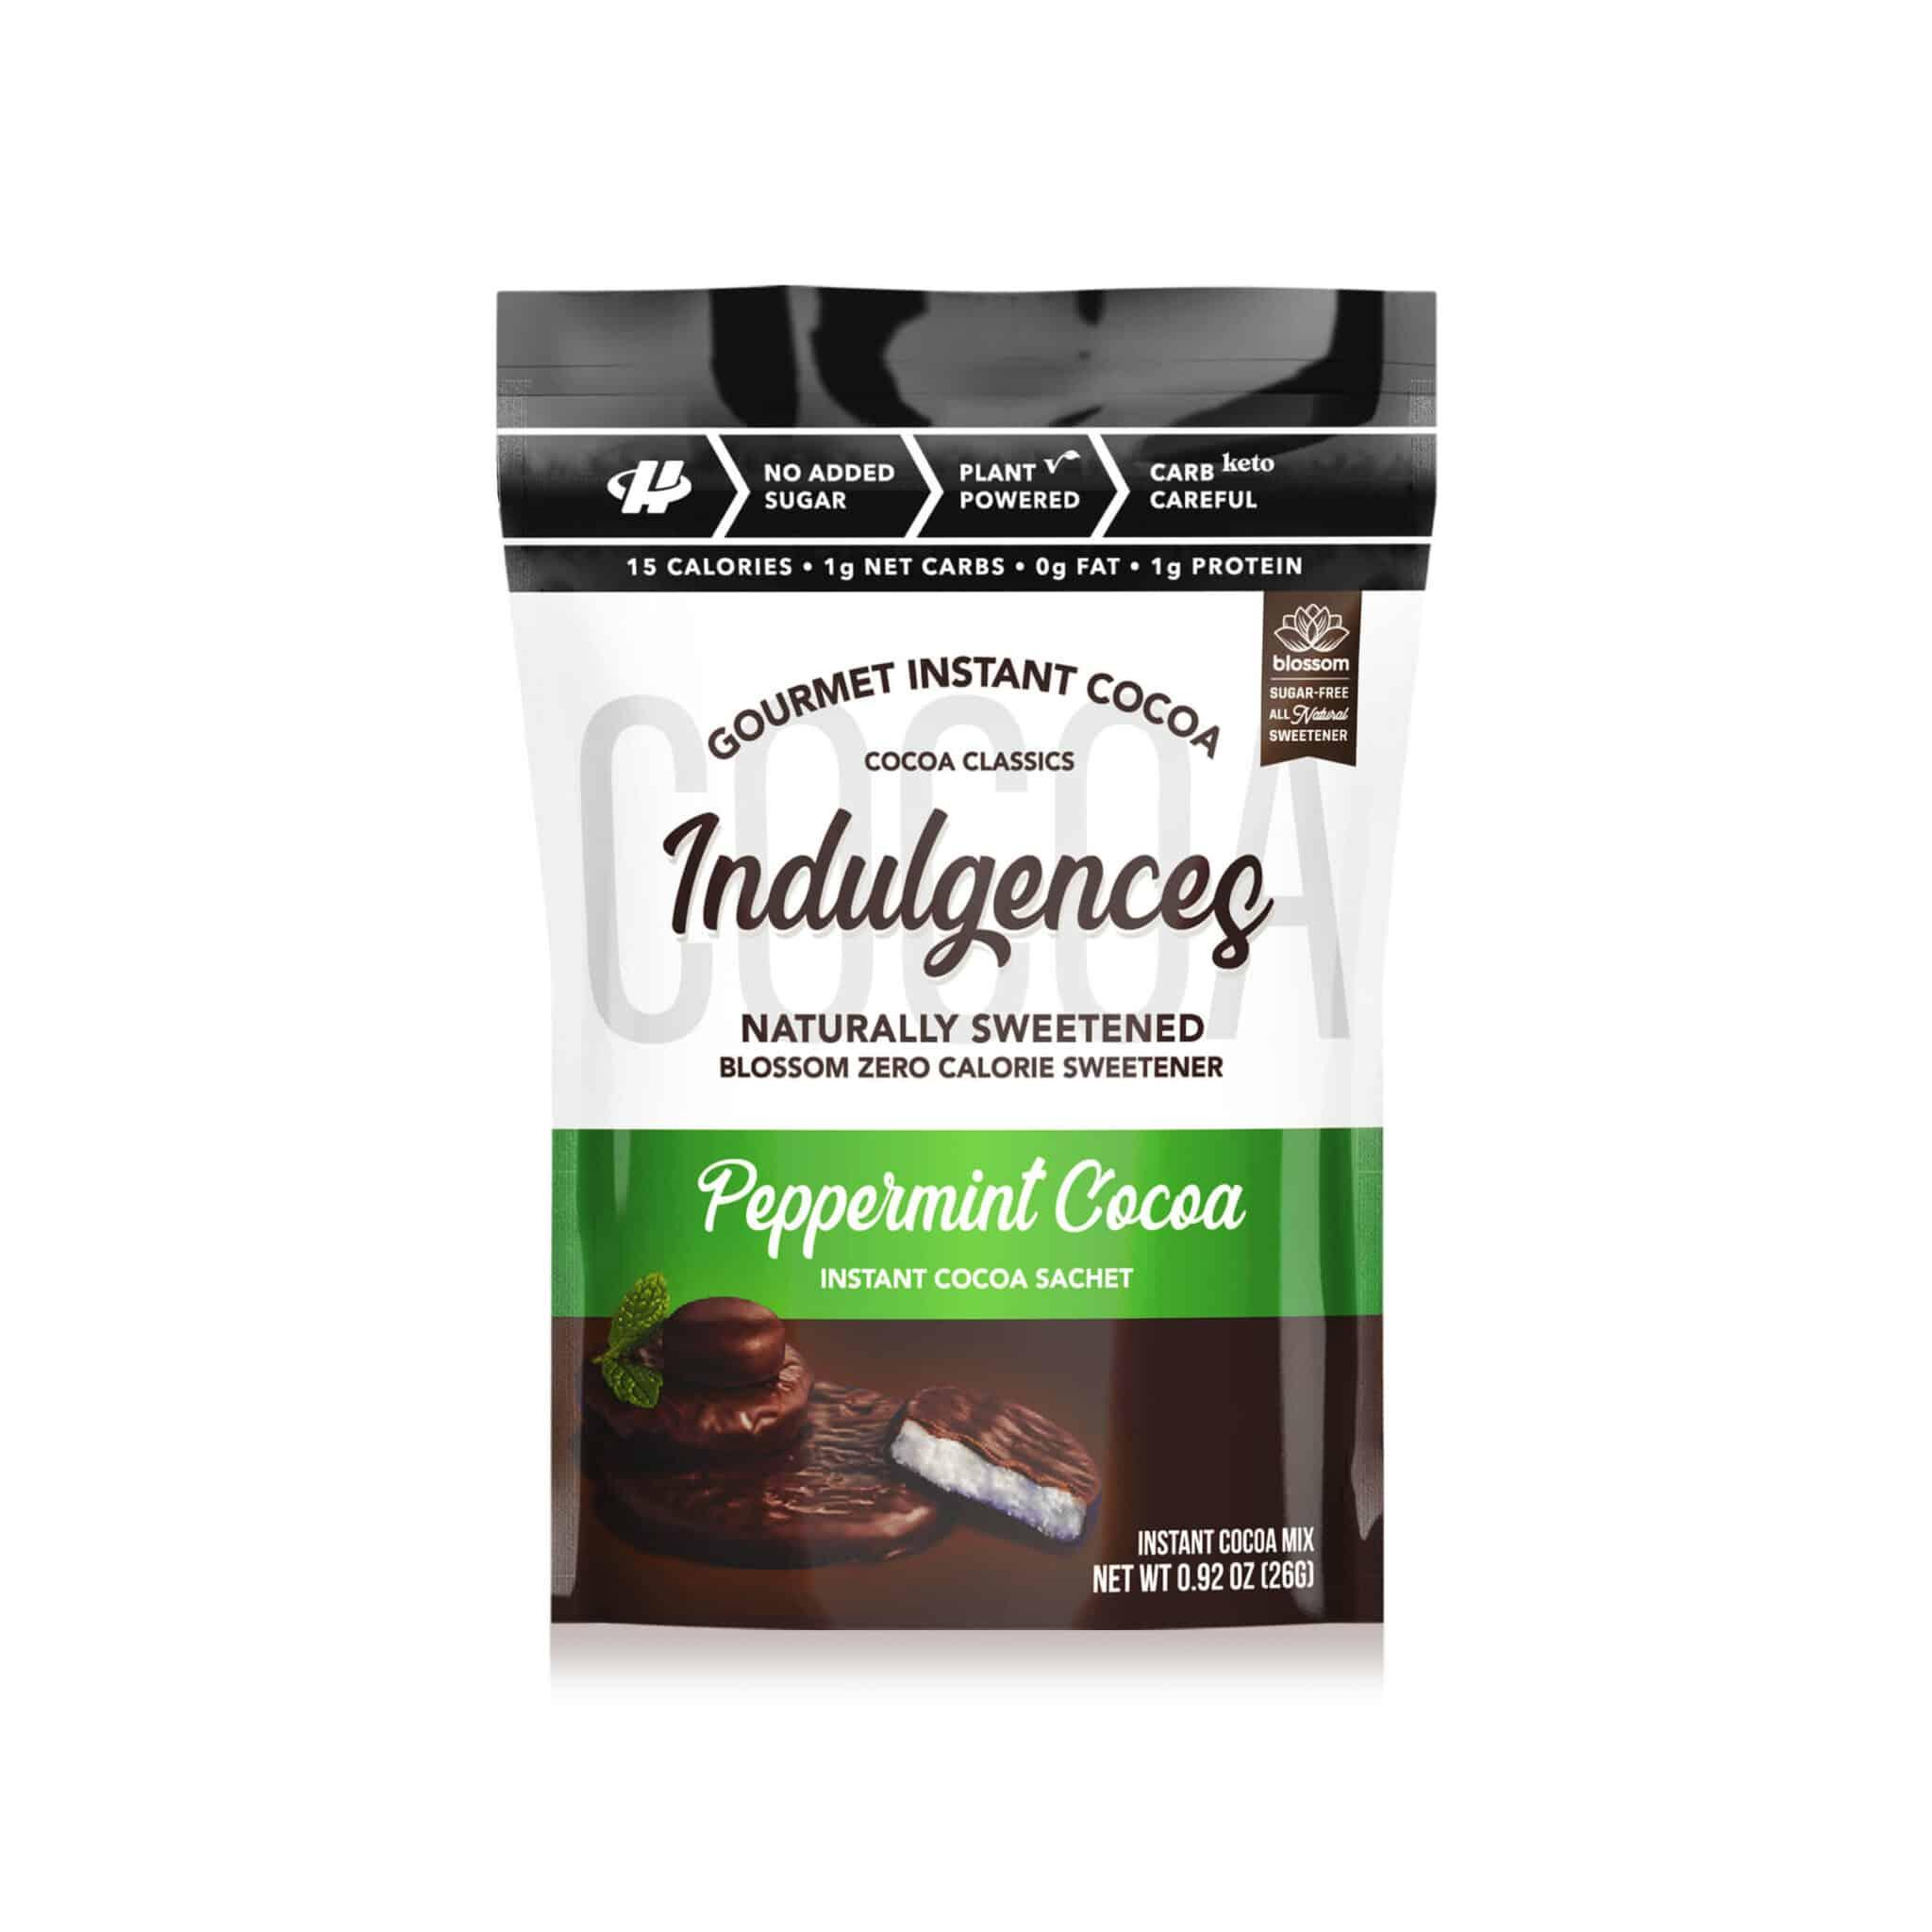 Indulgences Peppermint Keto Cocoa